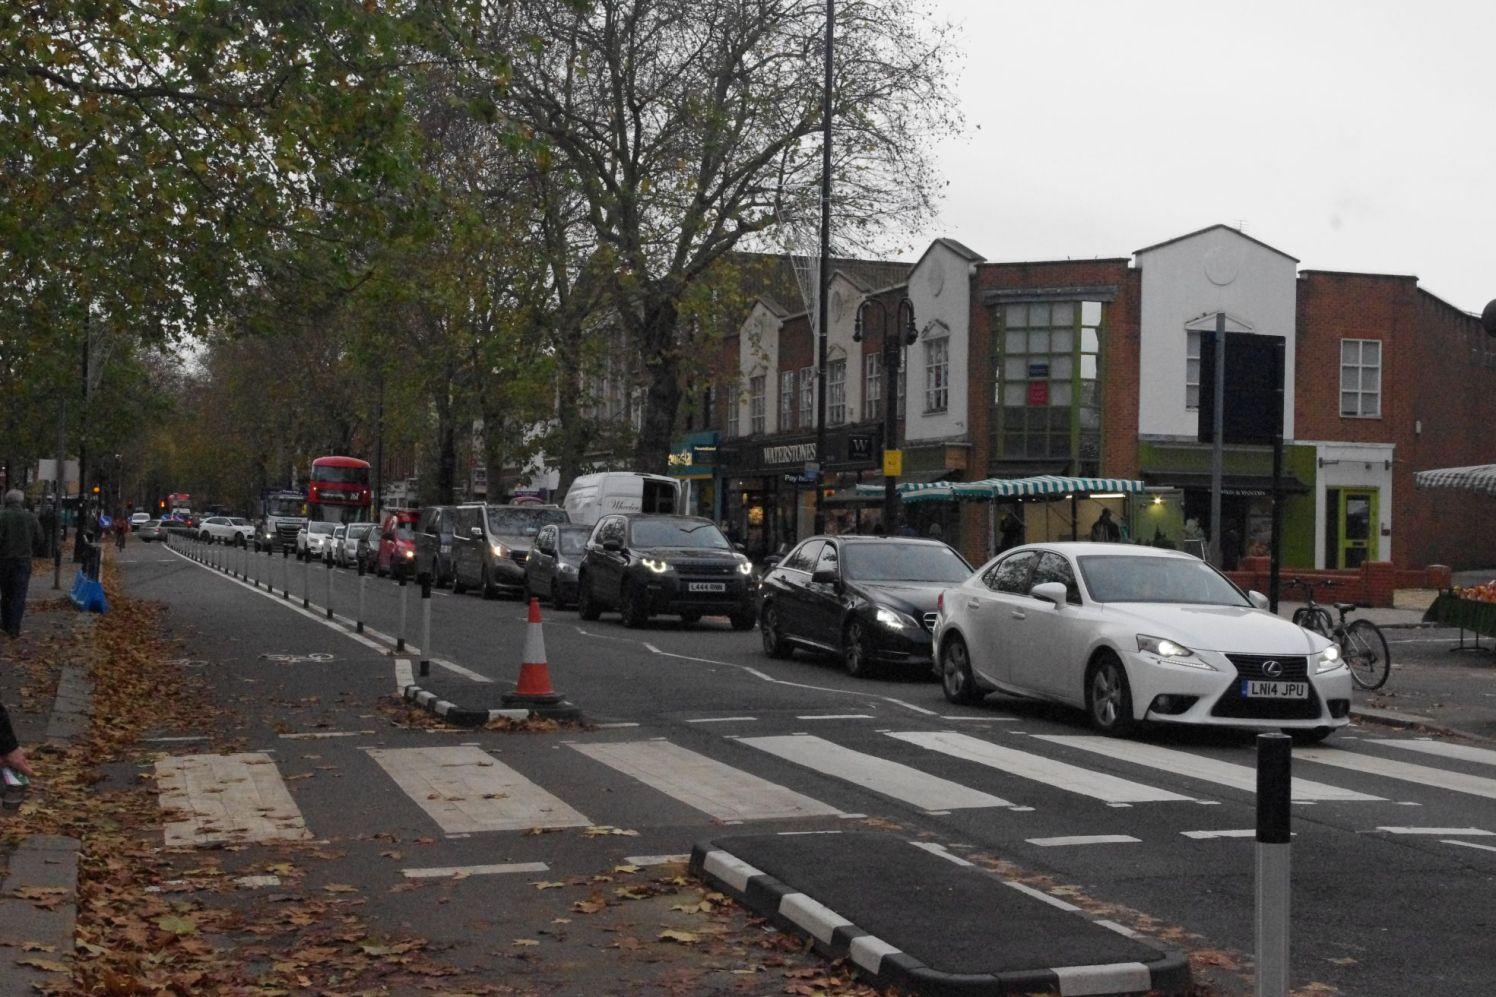 Traffic on Chiswick High Rd 1_web - Alanna McCrum